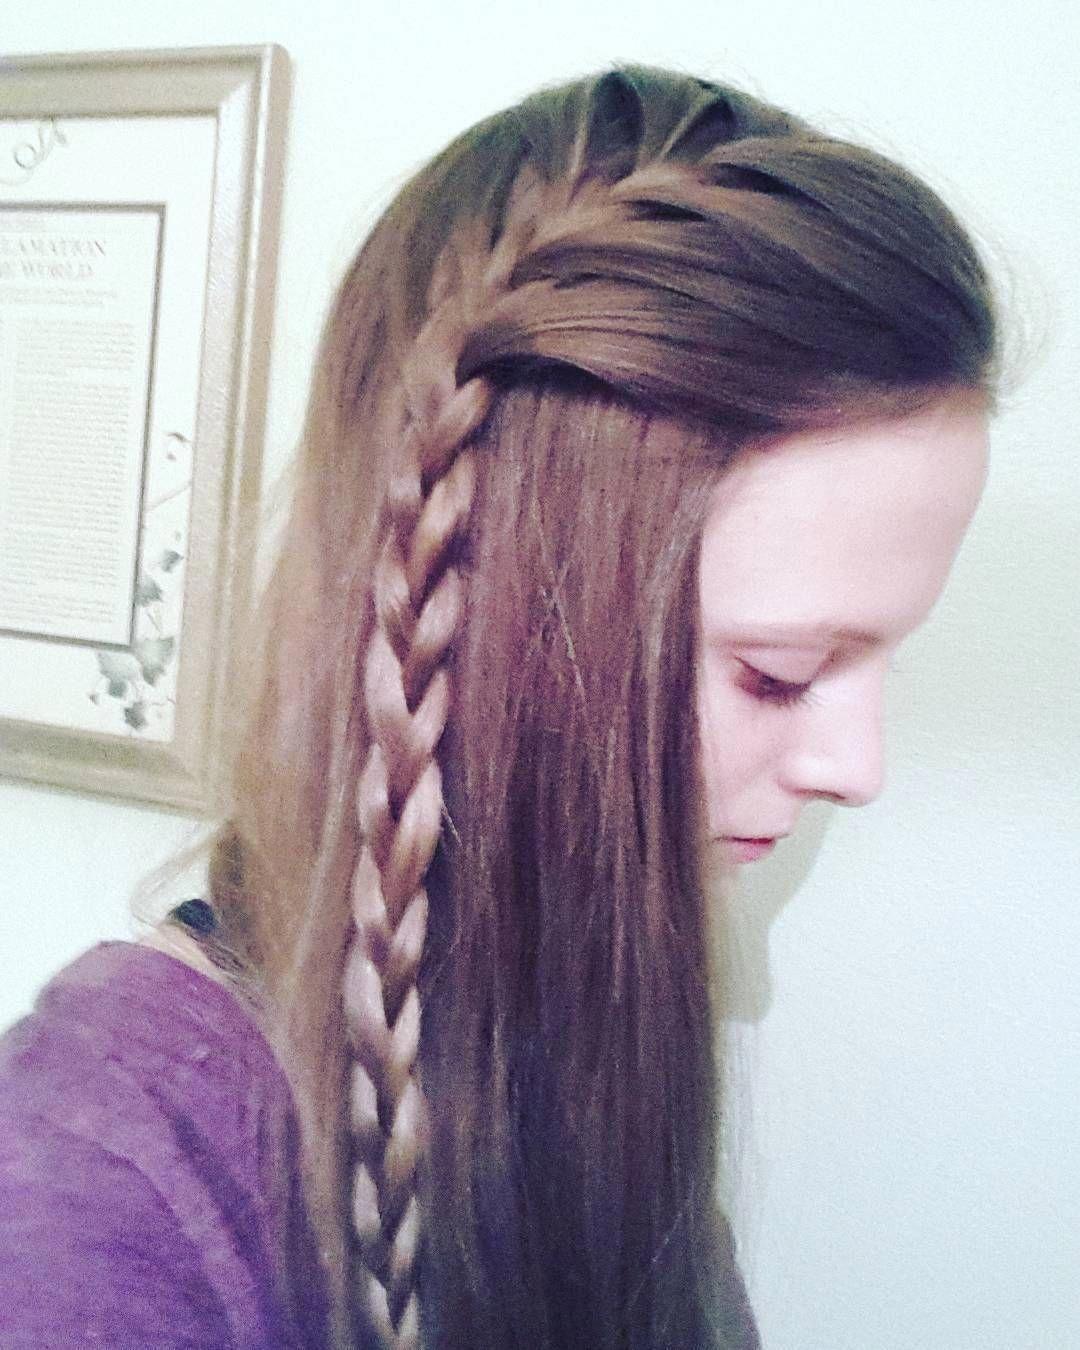 Lemonade braids    #torontohairstylist #torontobraider #hairbraider #braids #haircolour #explore #explorepage #singlebraids #mobilehairdresser #fishbonebraids #mensbraids #highlights #mensbraidstyles #fulanibraids #colourist #haircut #boxbraids #braidswithextensions #feedinbraids #balayage #ombre #freestylebraids #braidstyles #weave #sewinponytail #knotlessboxbraids #blondehair #wellahaircolour #gtabraider #roseroyalehair